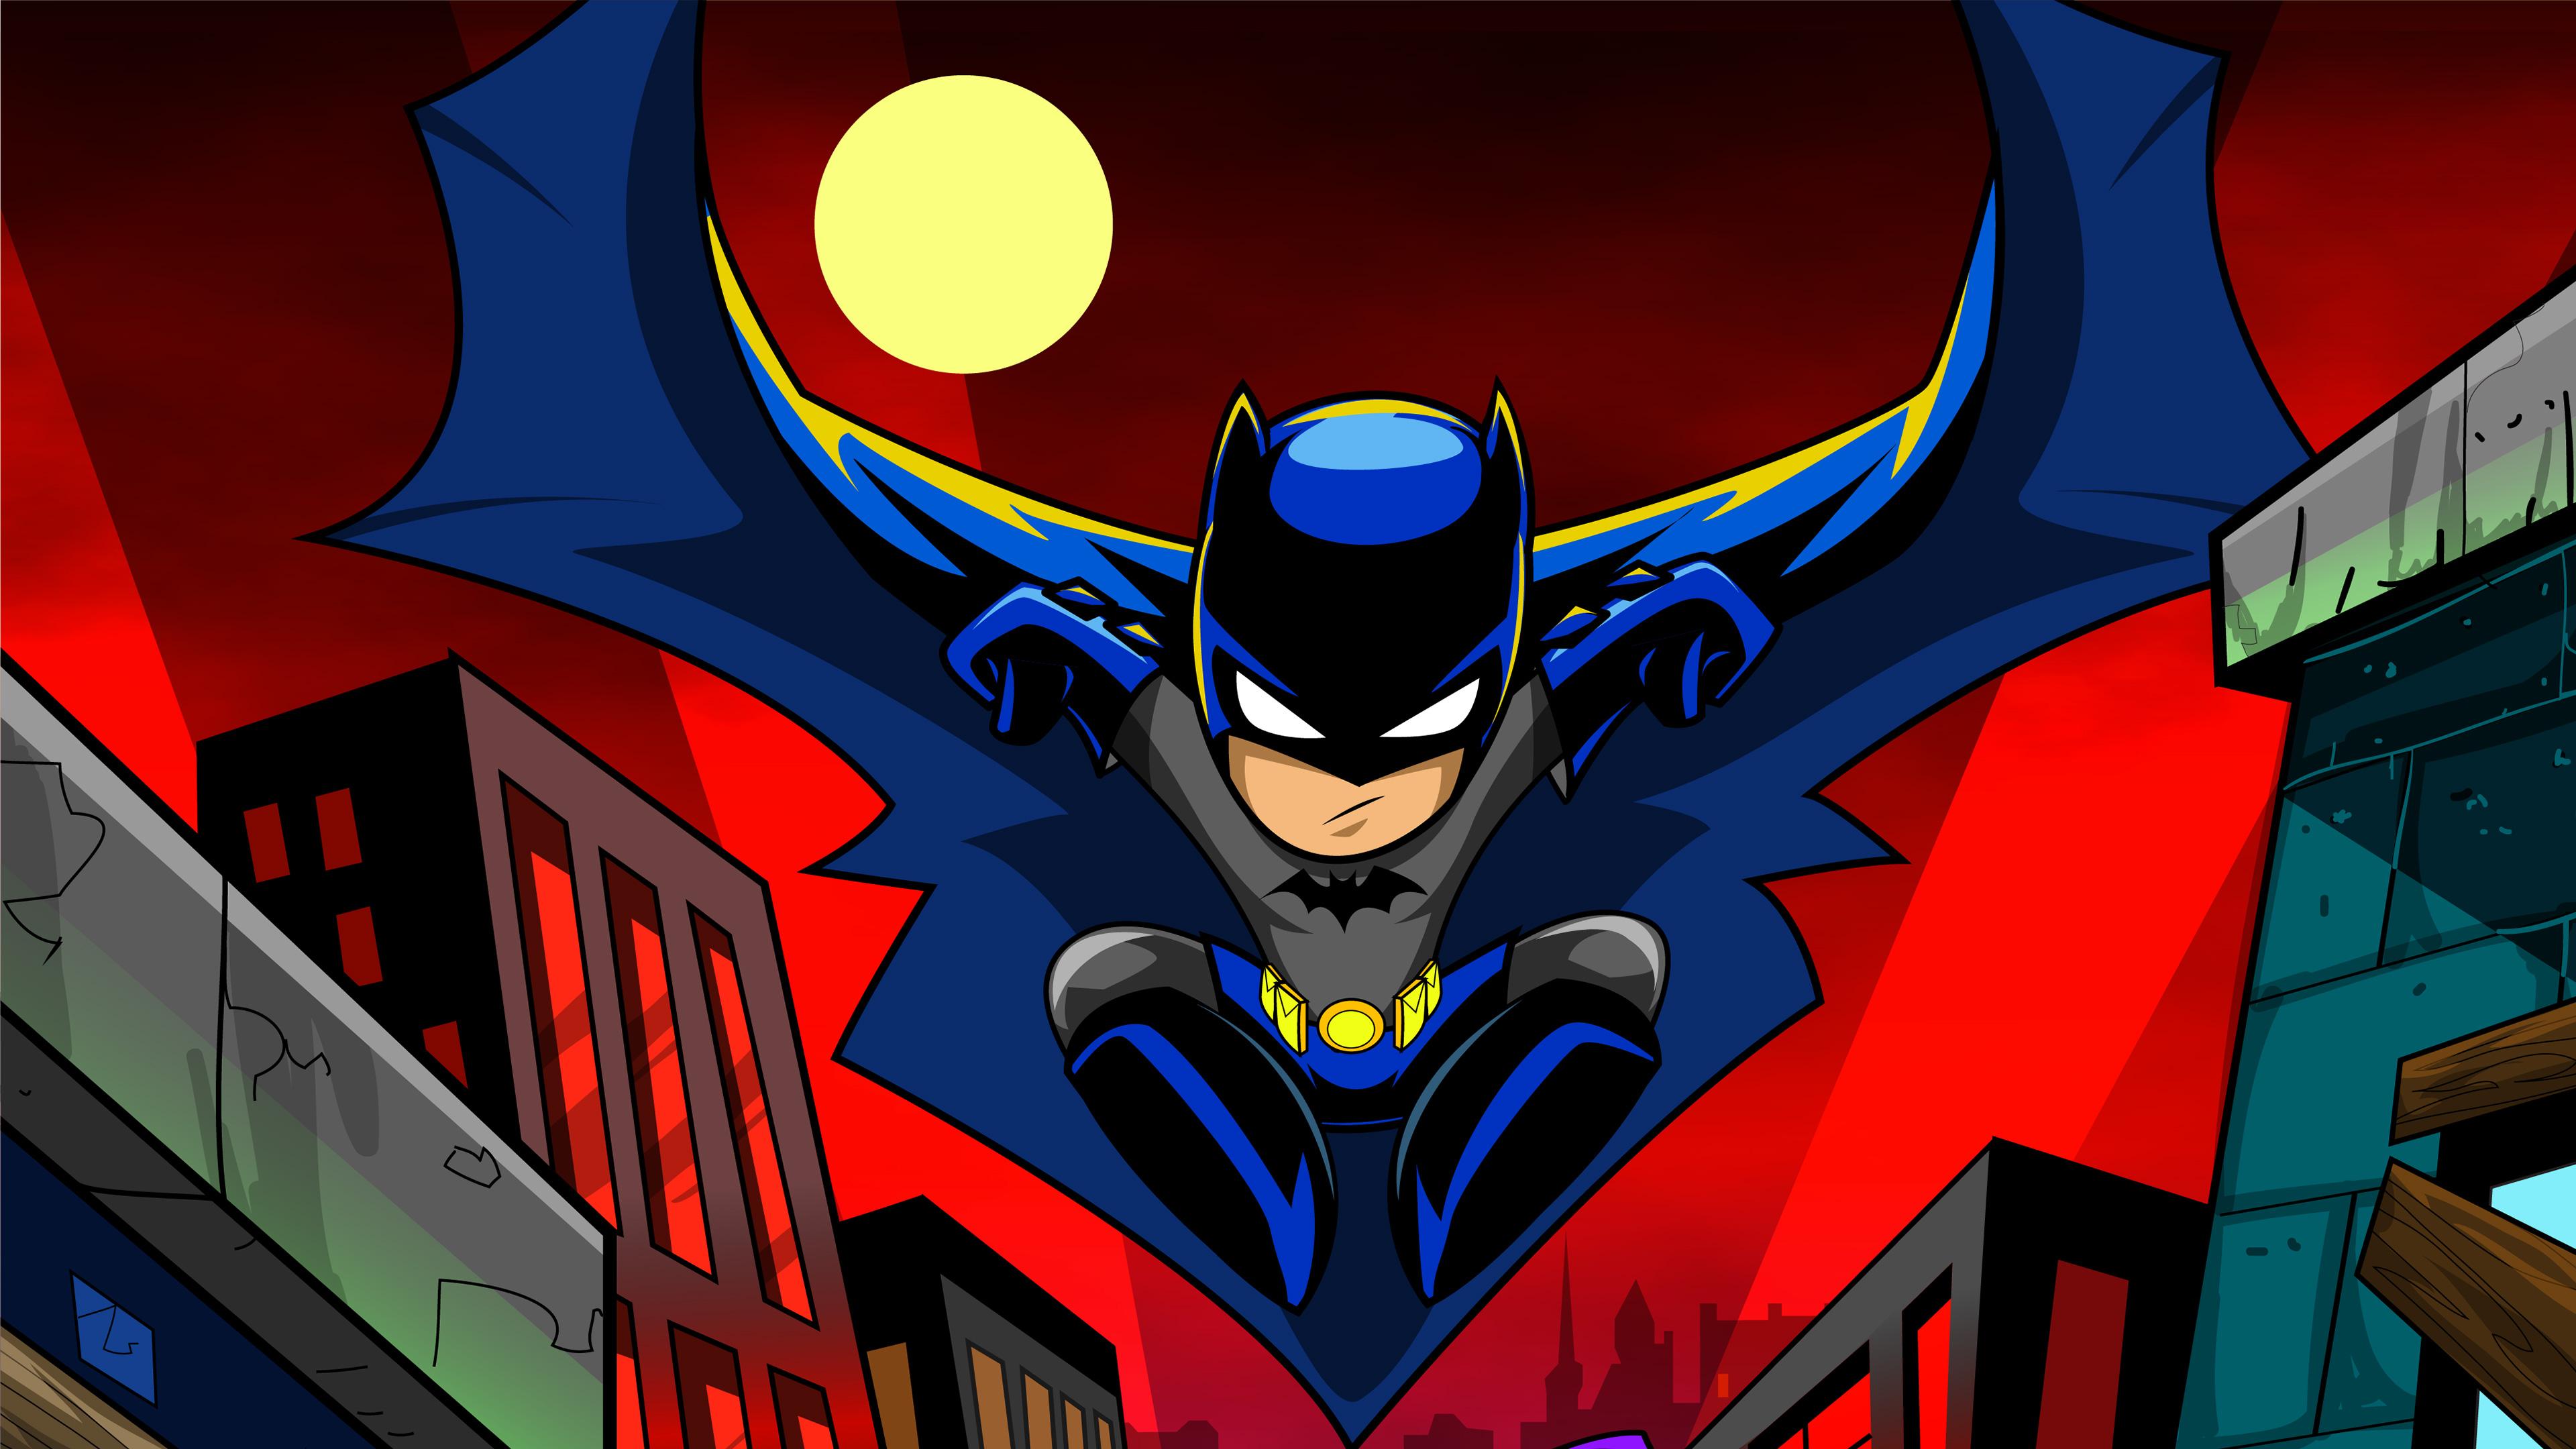 Joker Animated Wallpaper Batman Cartoon Art 4k Hd Superheroes 4k Wallpapers